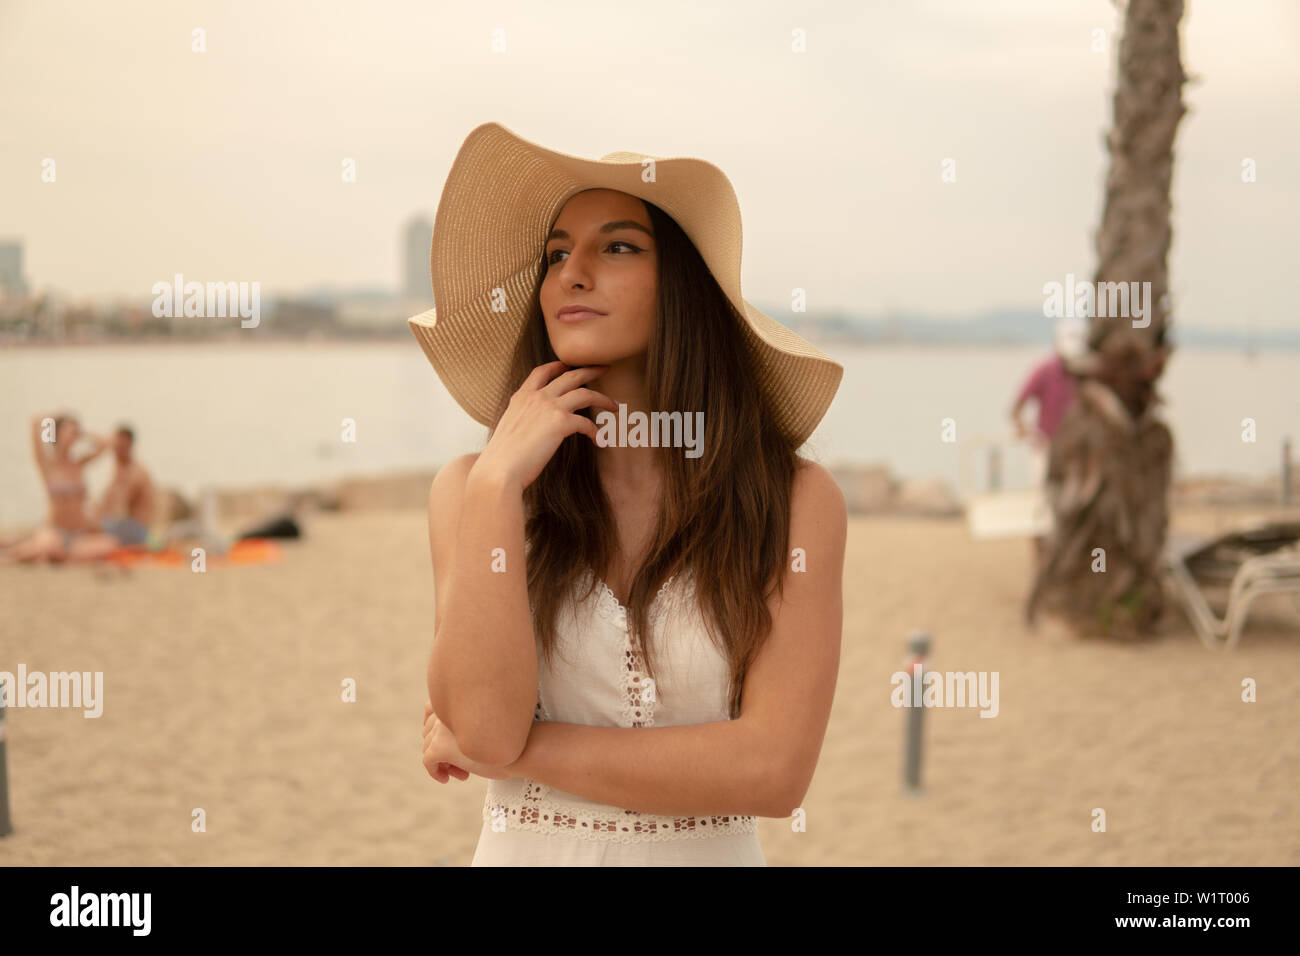 Pretty woman wearing white dress and pamela hat standing Stock Photo